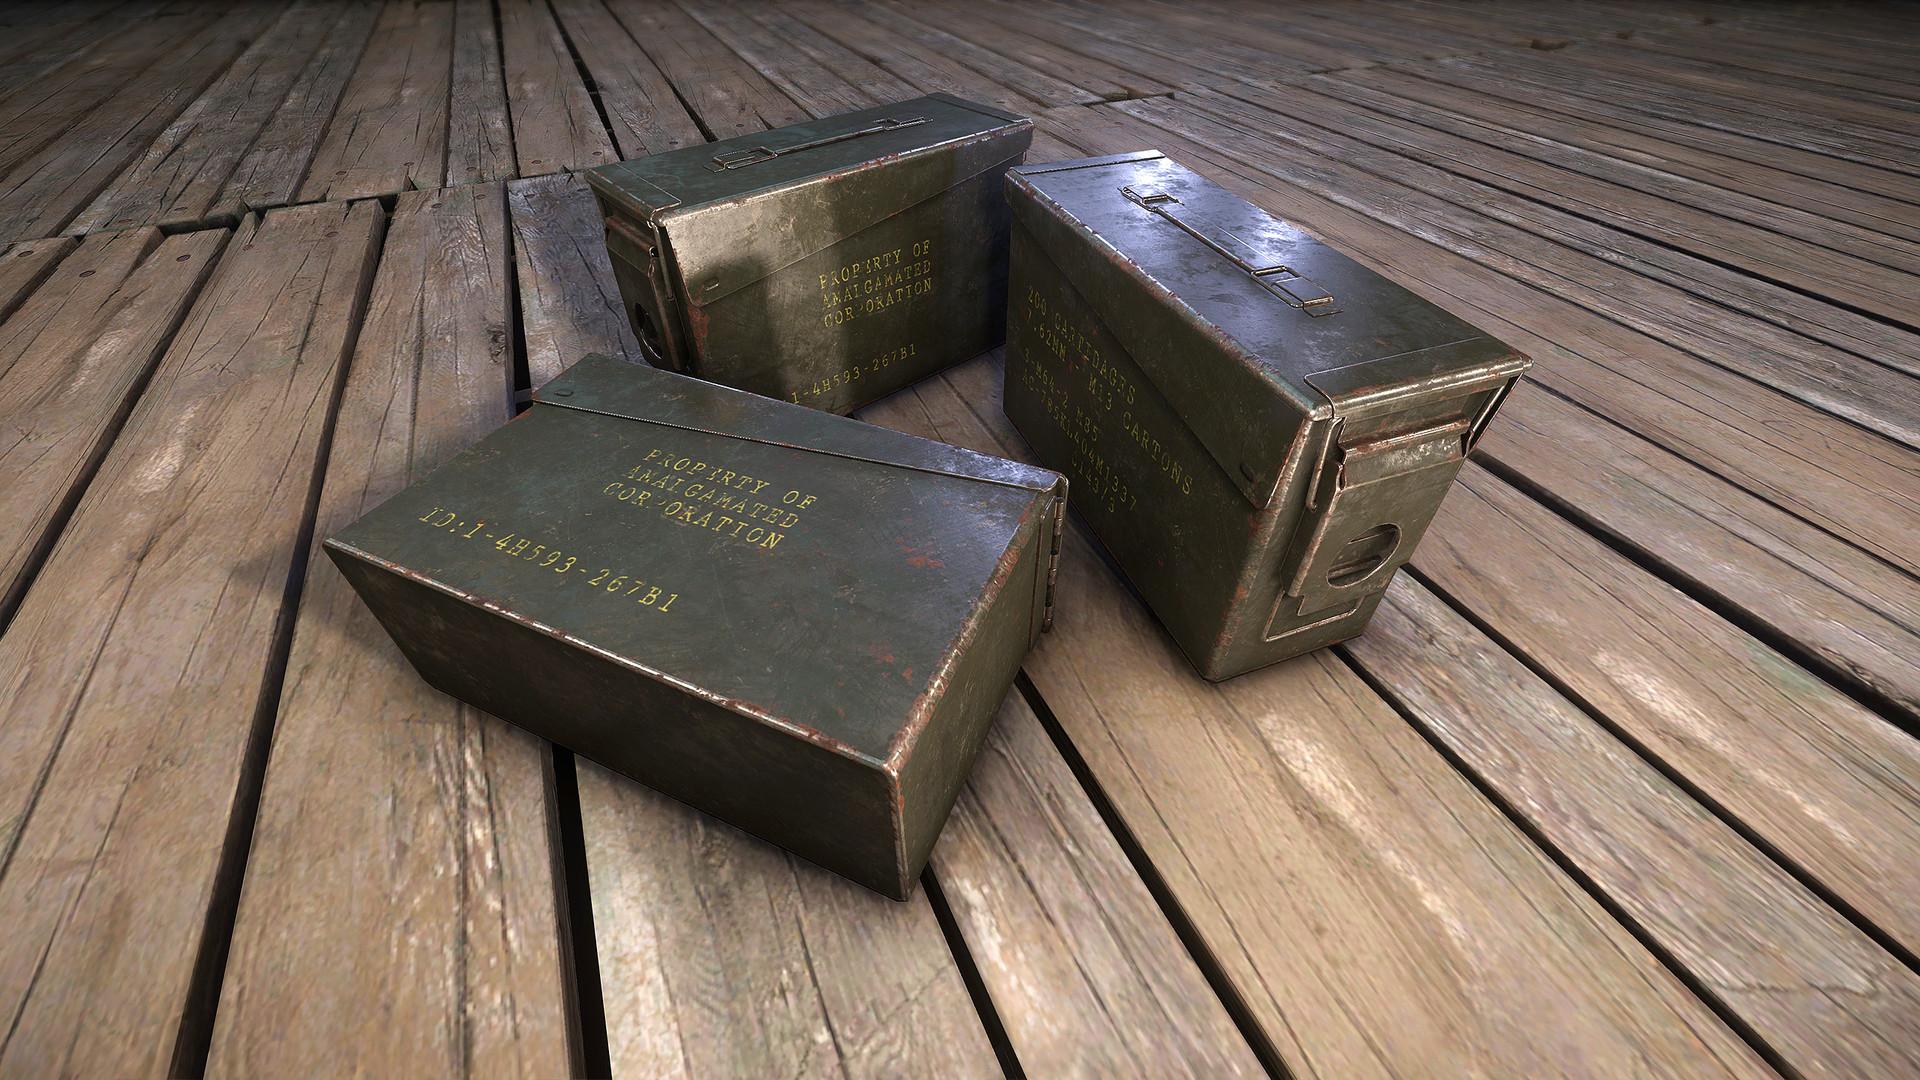 Carl kent ammo box v2